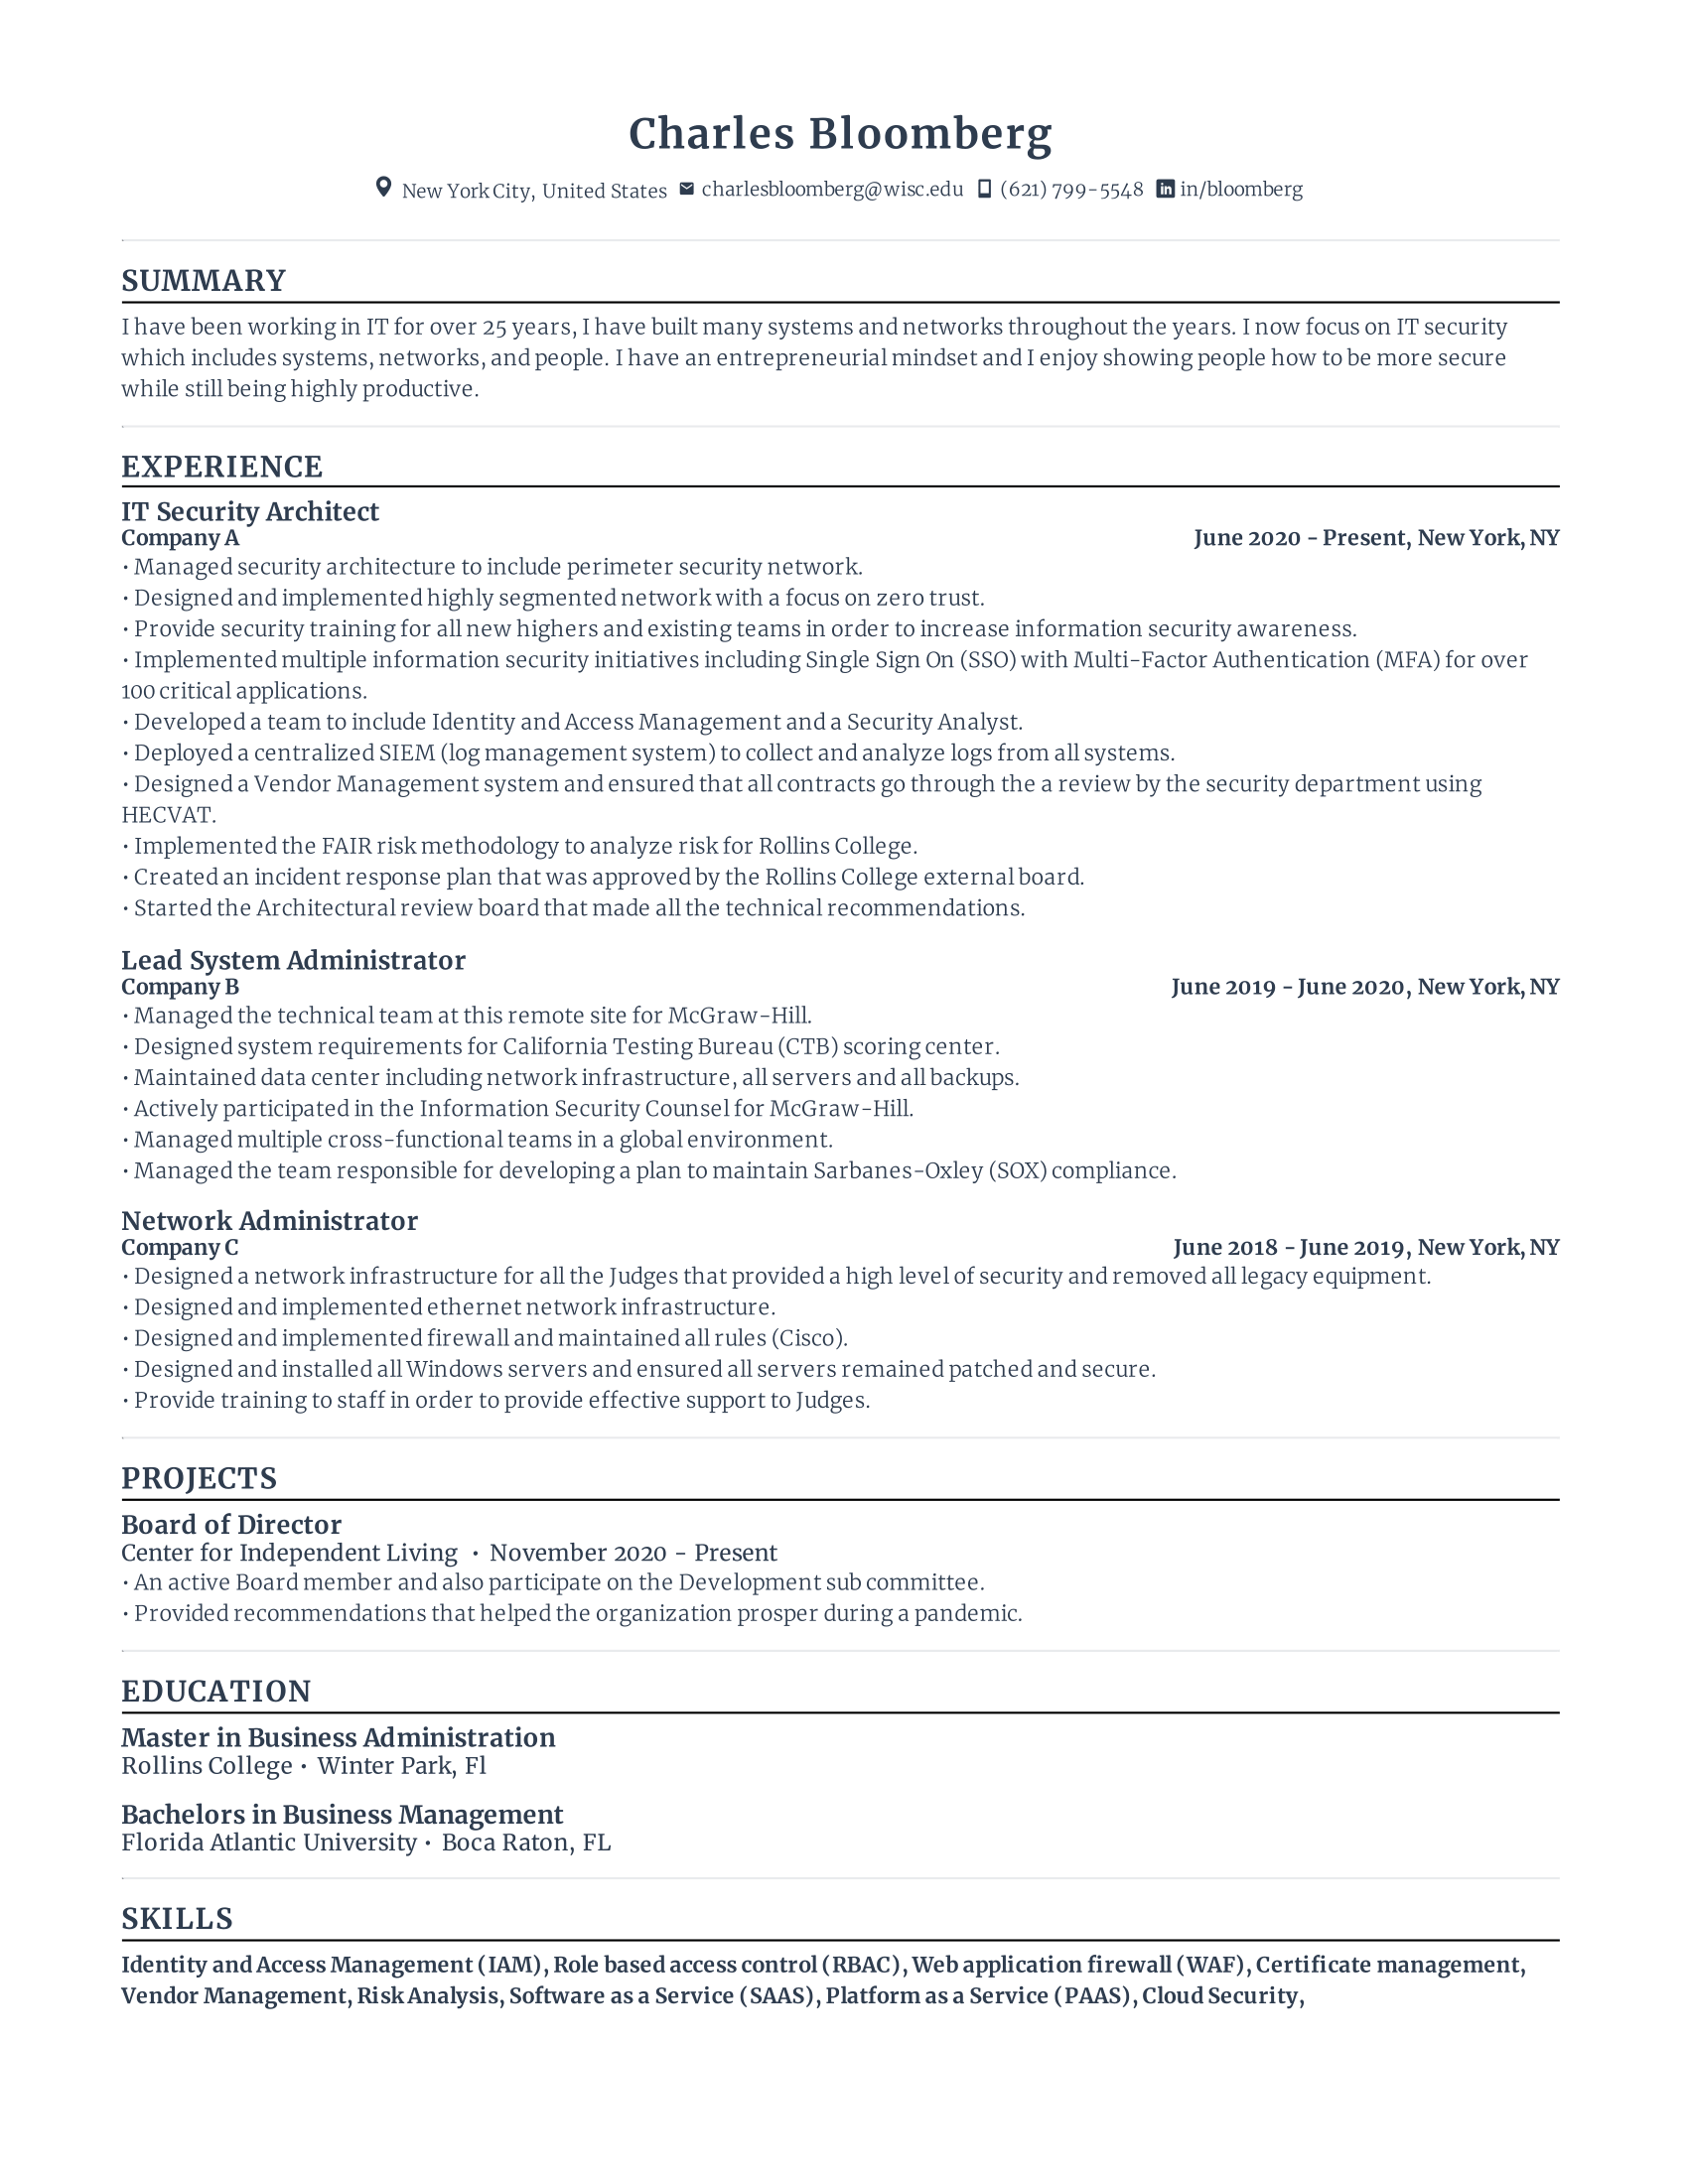 IT Security Architect Resume